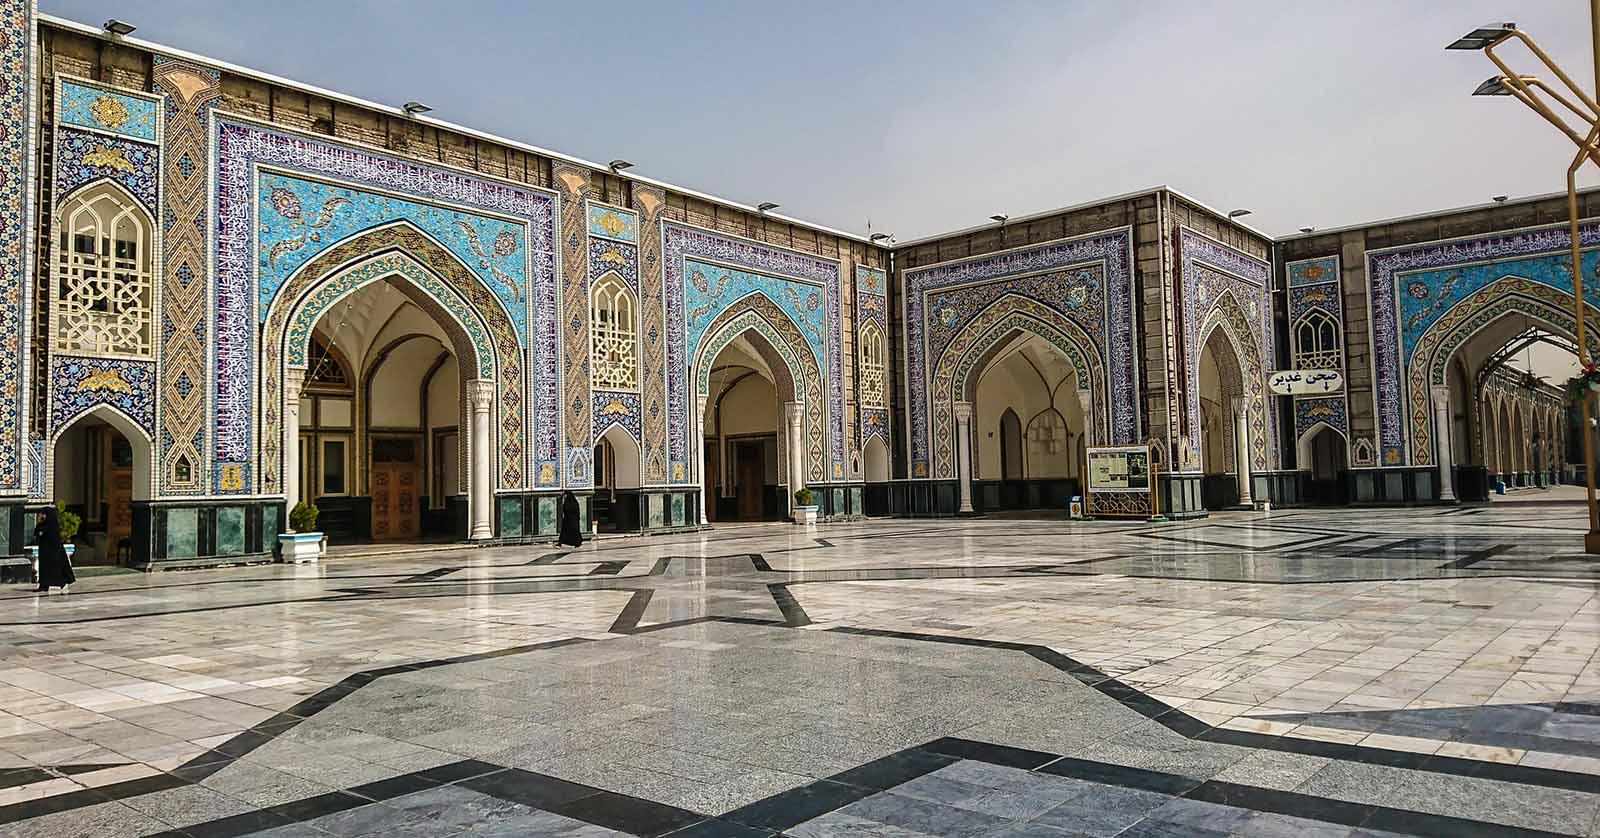 Alui ibn Musa ar Reza Heiligtum